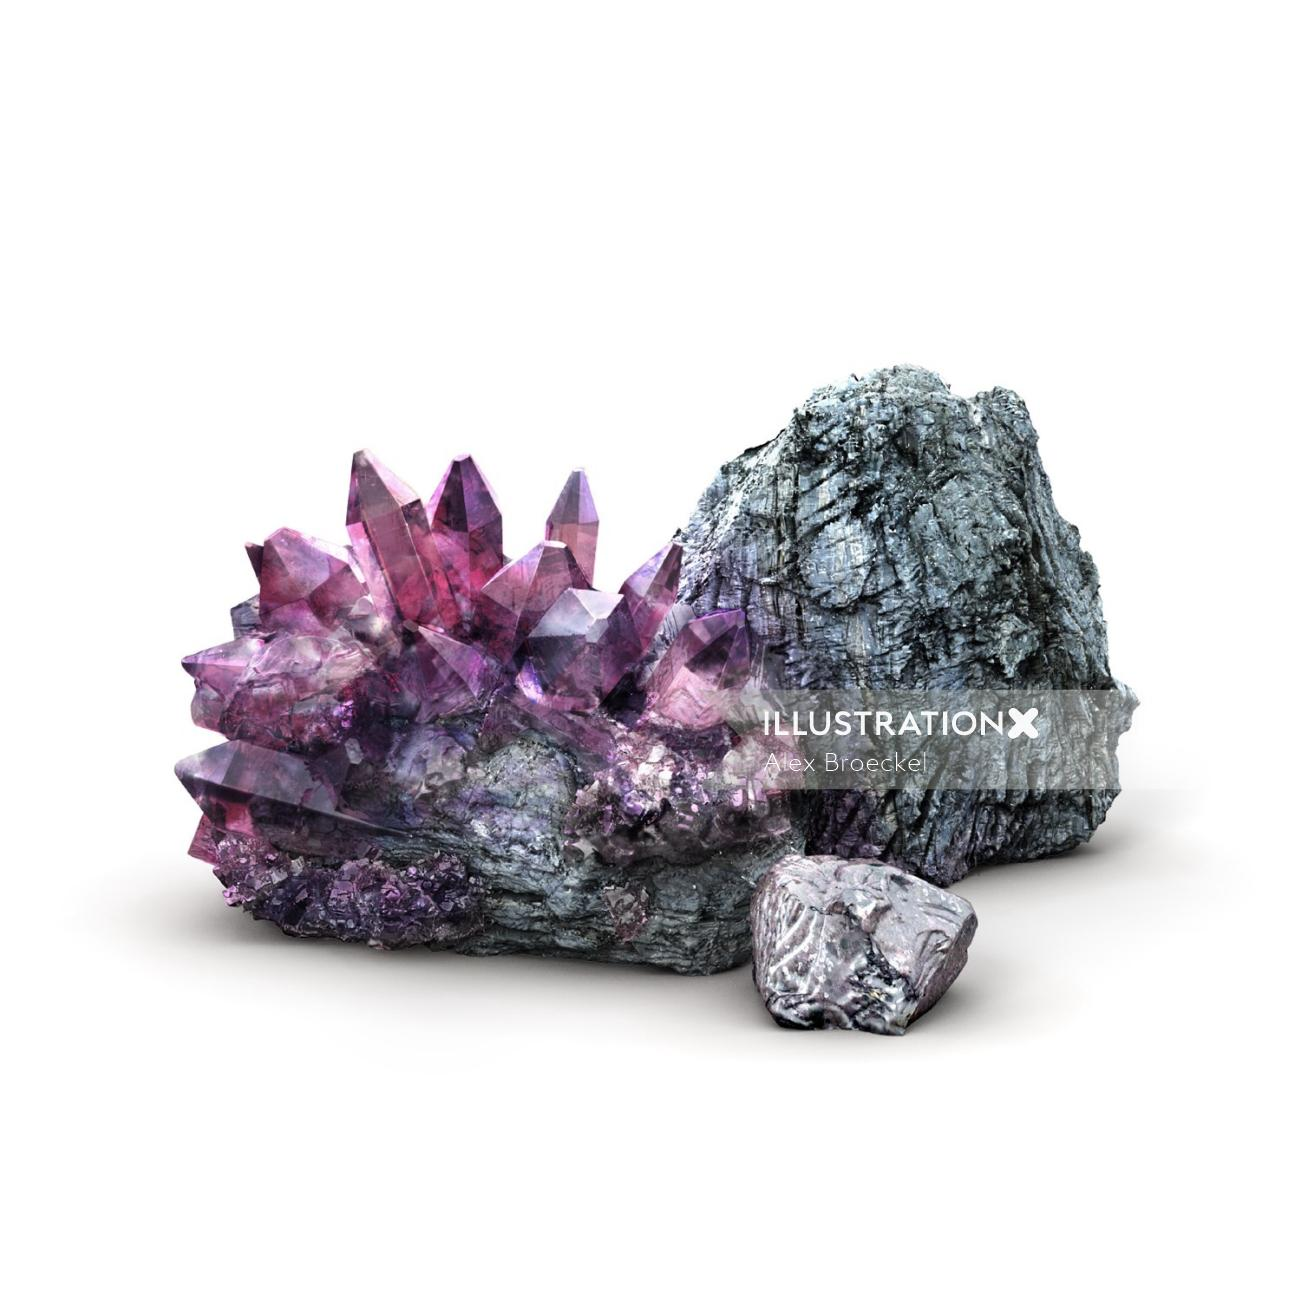 3d illustration of crystal